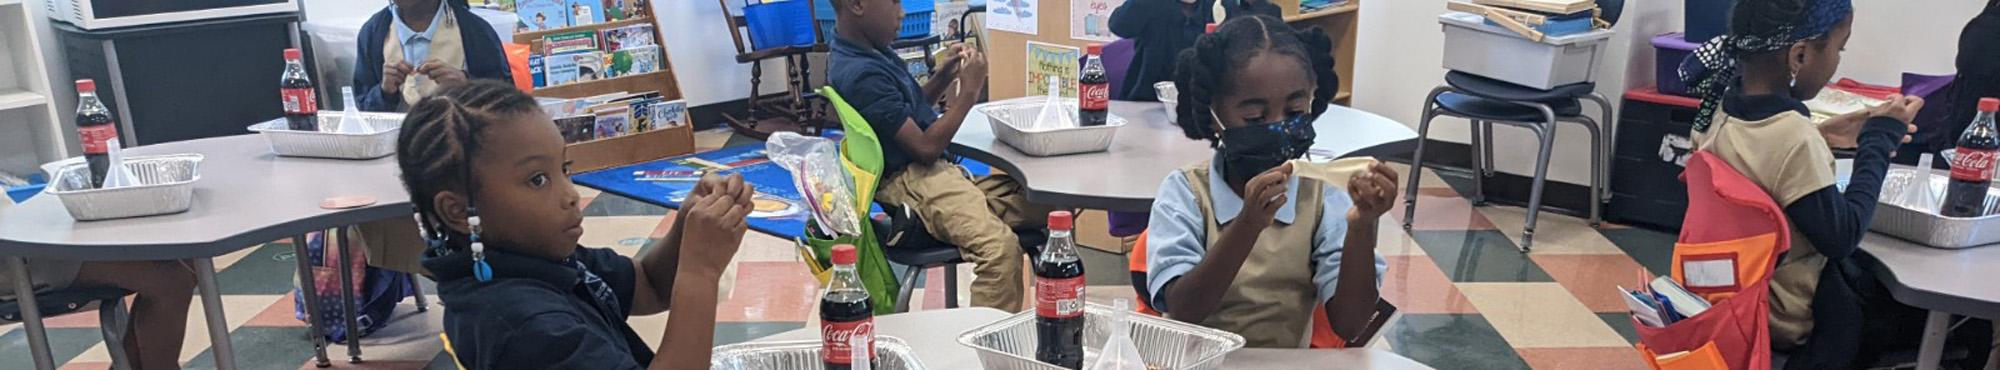 Teacher engaging with student via virtual classroom